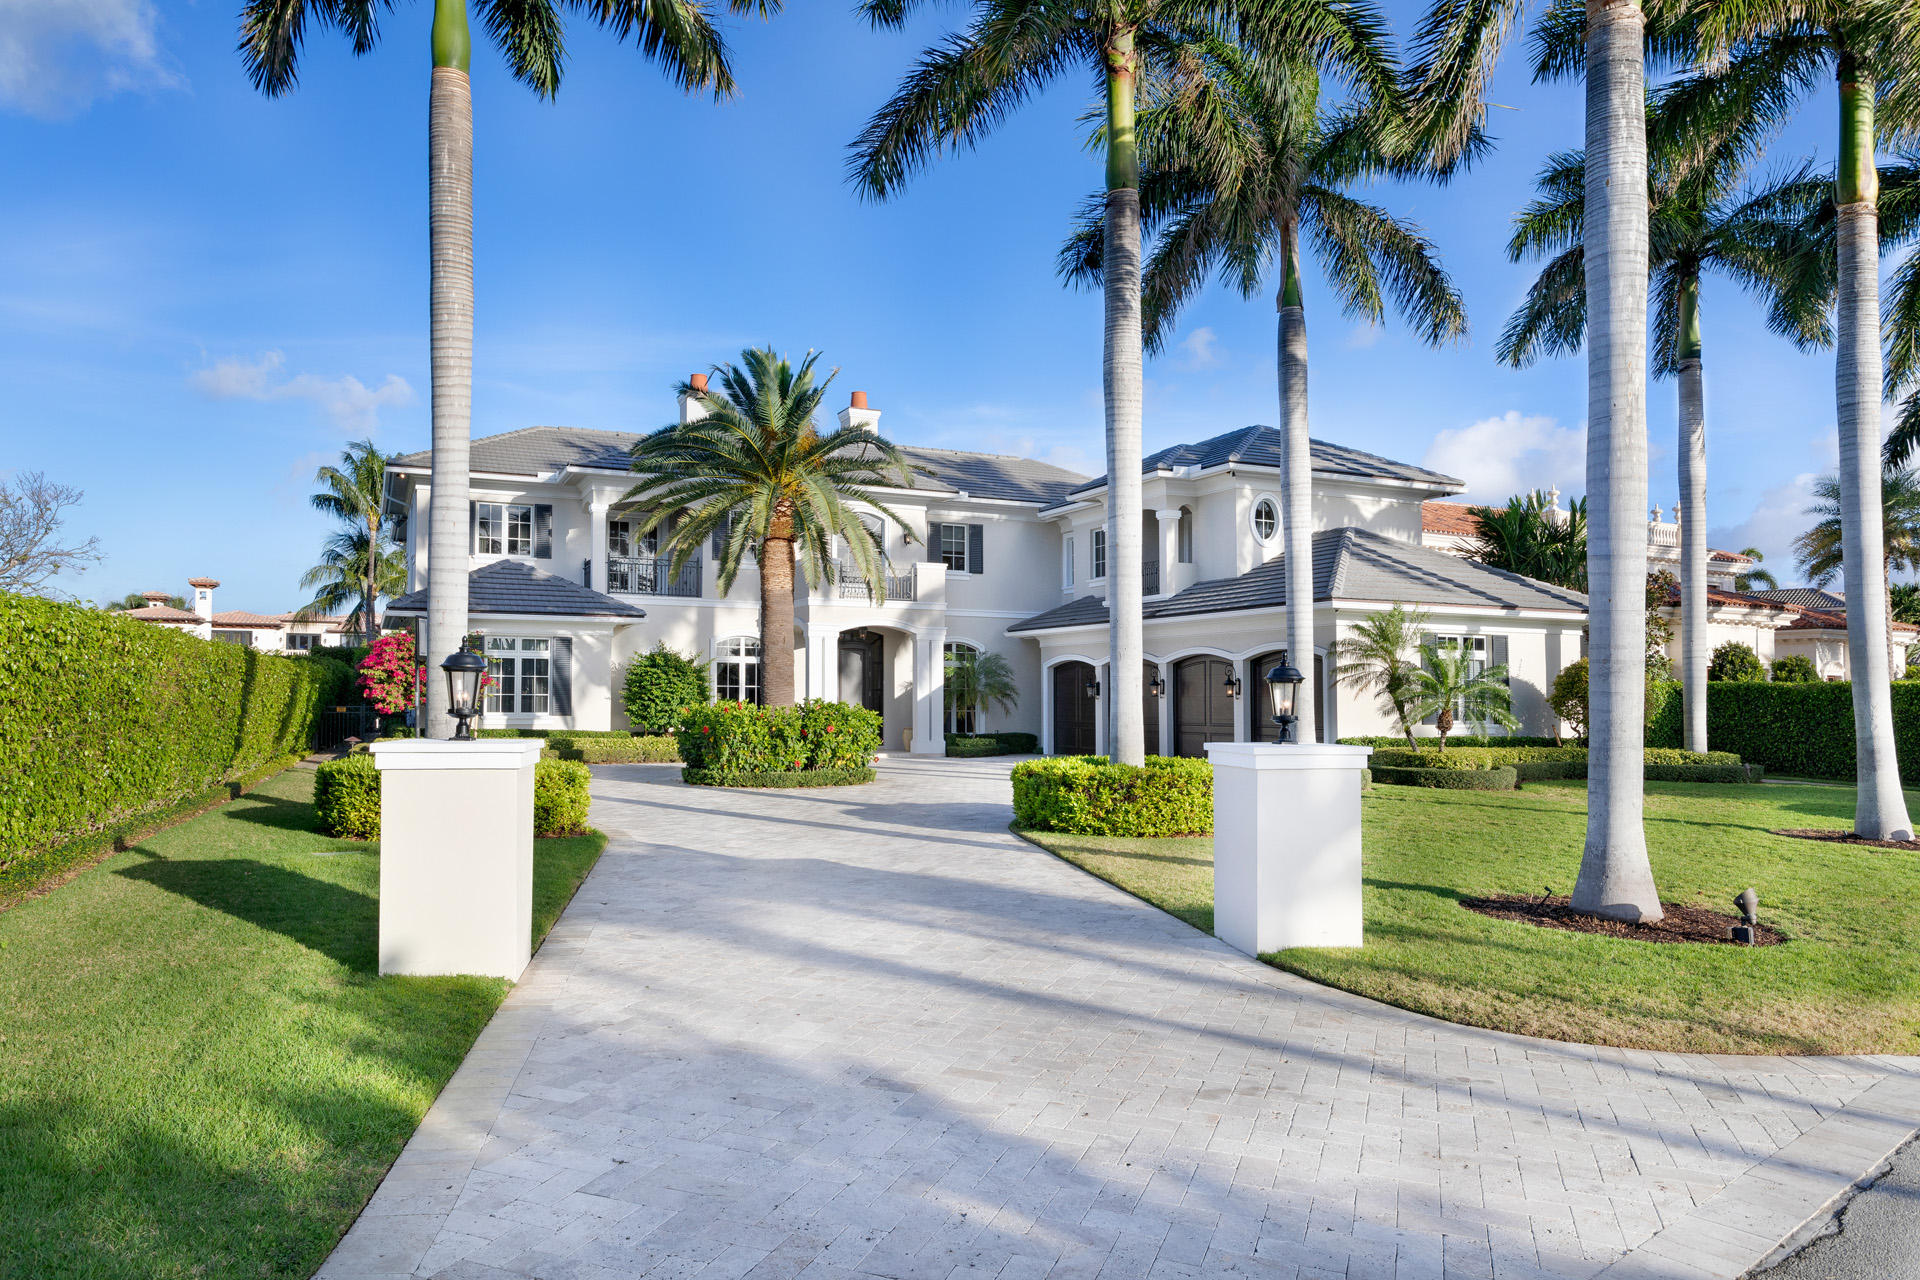 Photo of 429 E Alexander Palm Road, Boca Raton, FL 33432